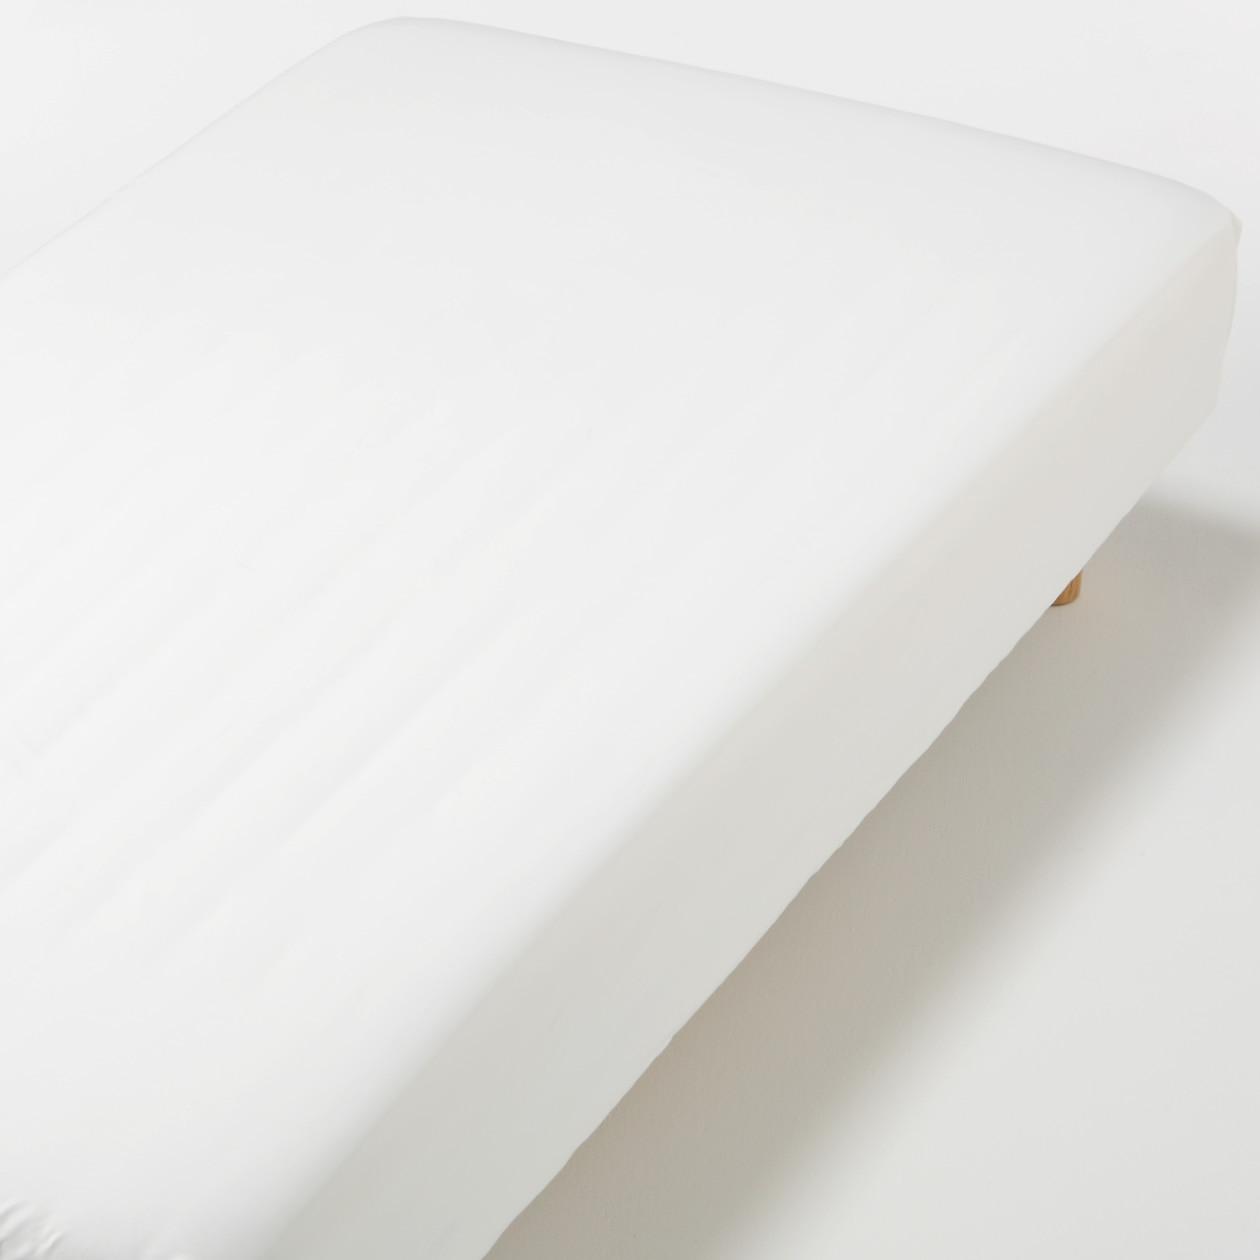 RoomClip商品情報 - インド綿高密度サテン織ホテル仕様ボックスシーツSD/オフ白